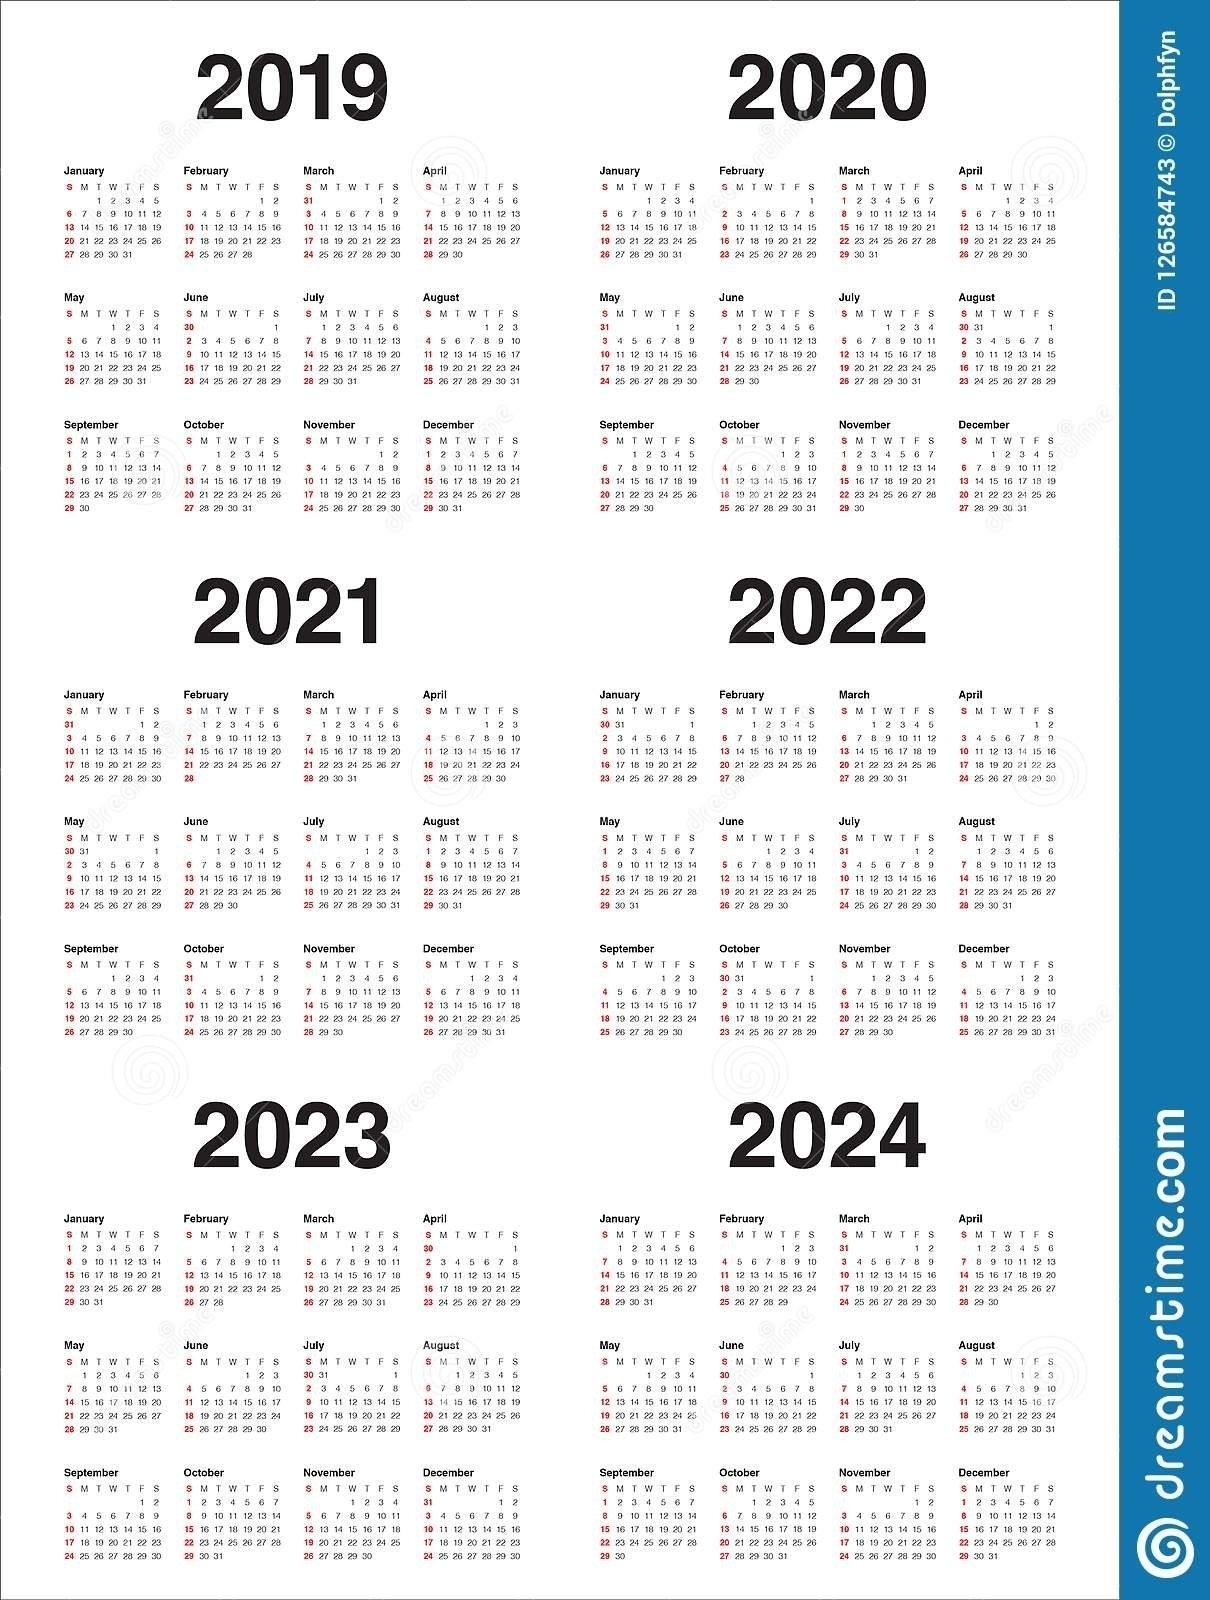 3 Year Calendar 2022 To 2024   Month Calendar Printable intended for Three Year Calendar 2019 2021 2021 Calendar Pedia Image